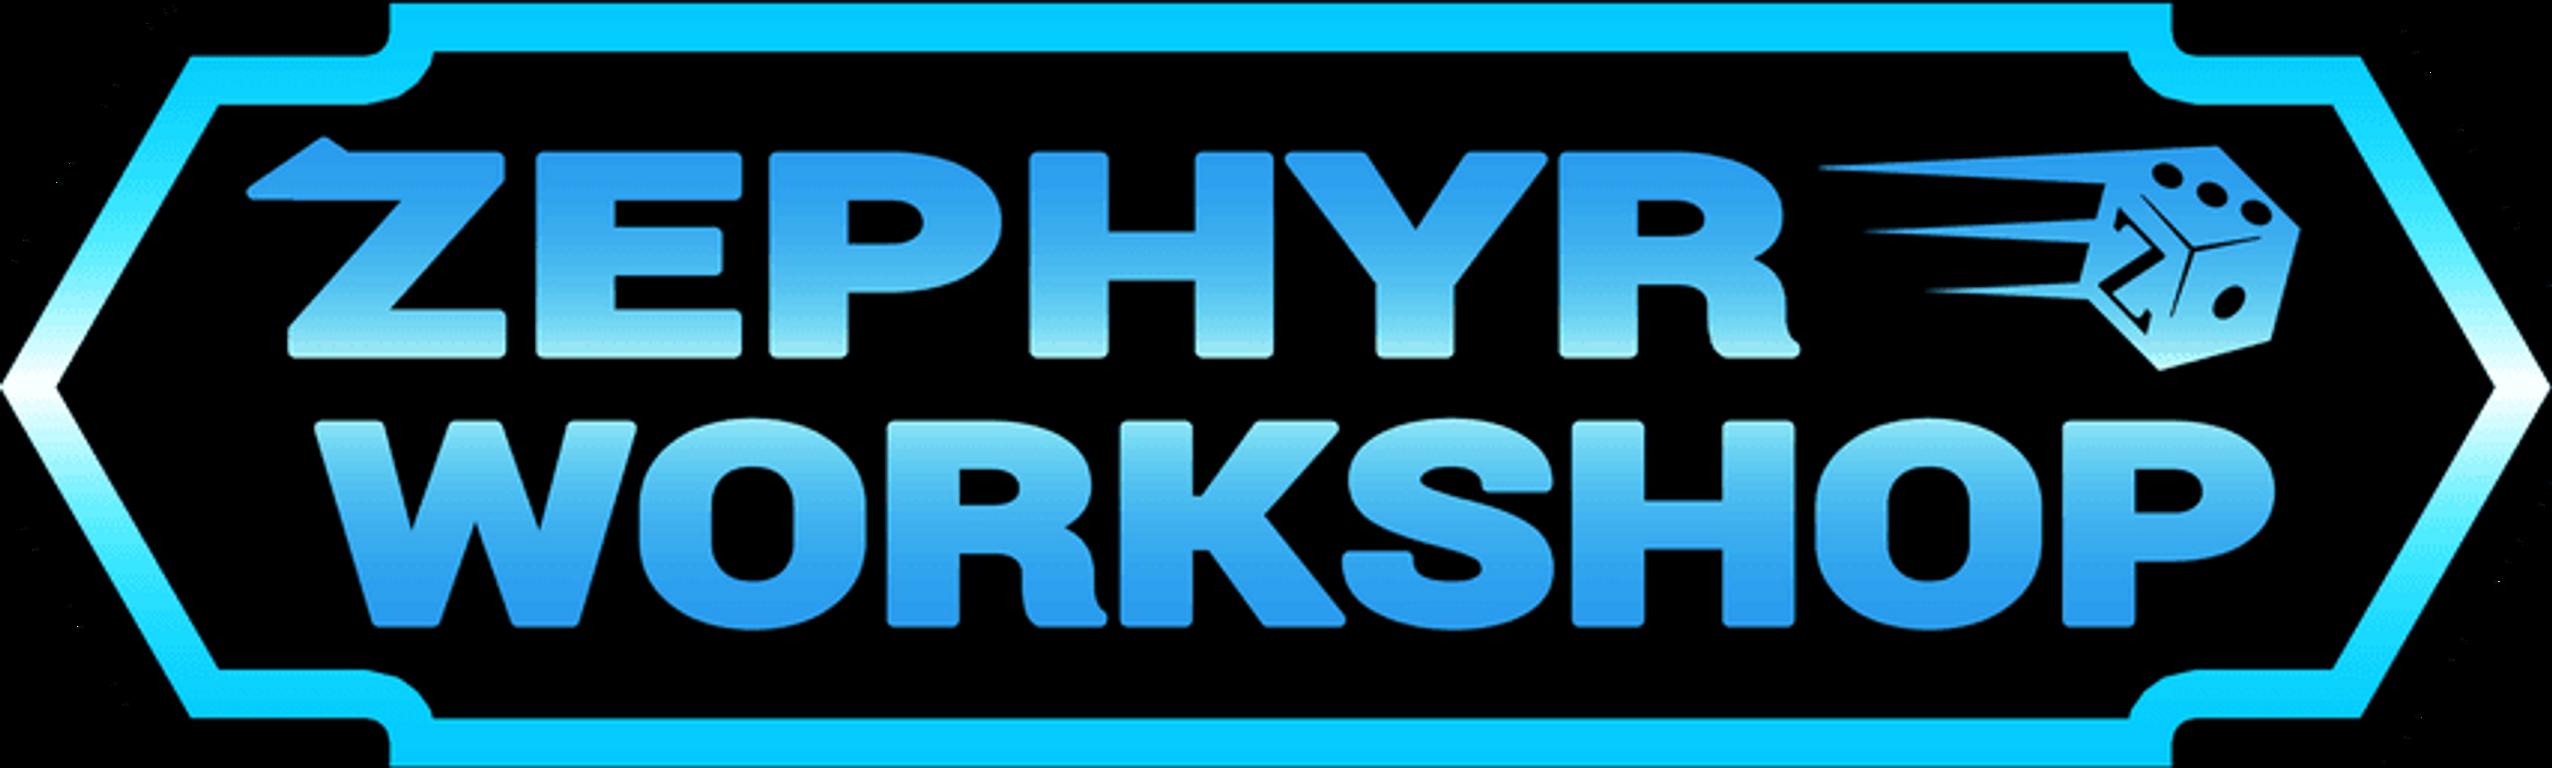 Zephyr Workshop